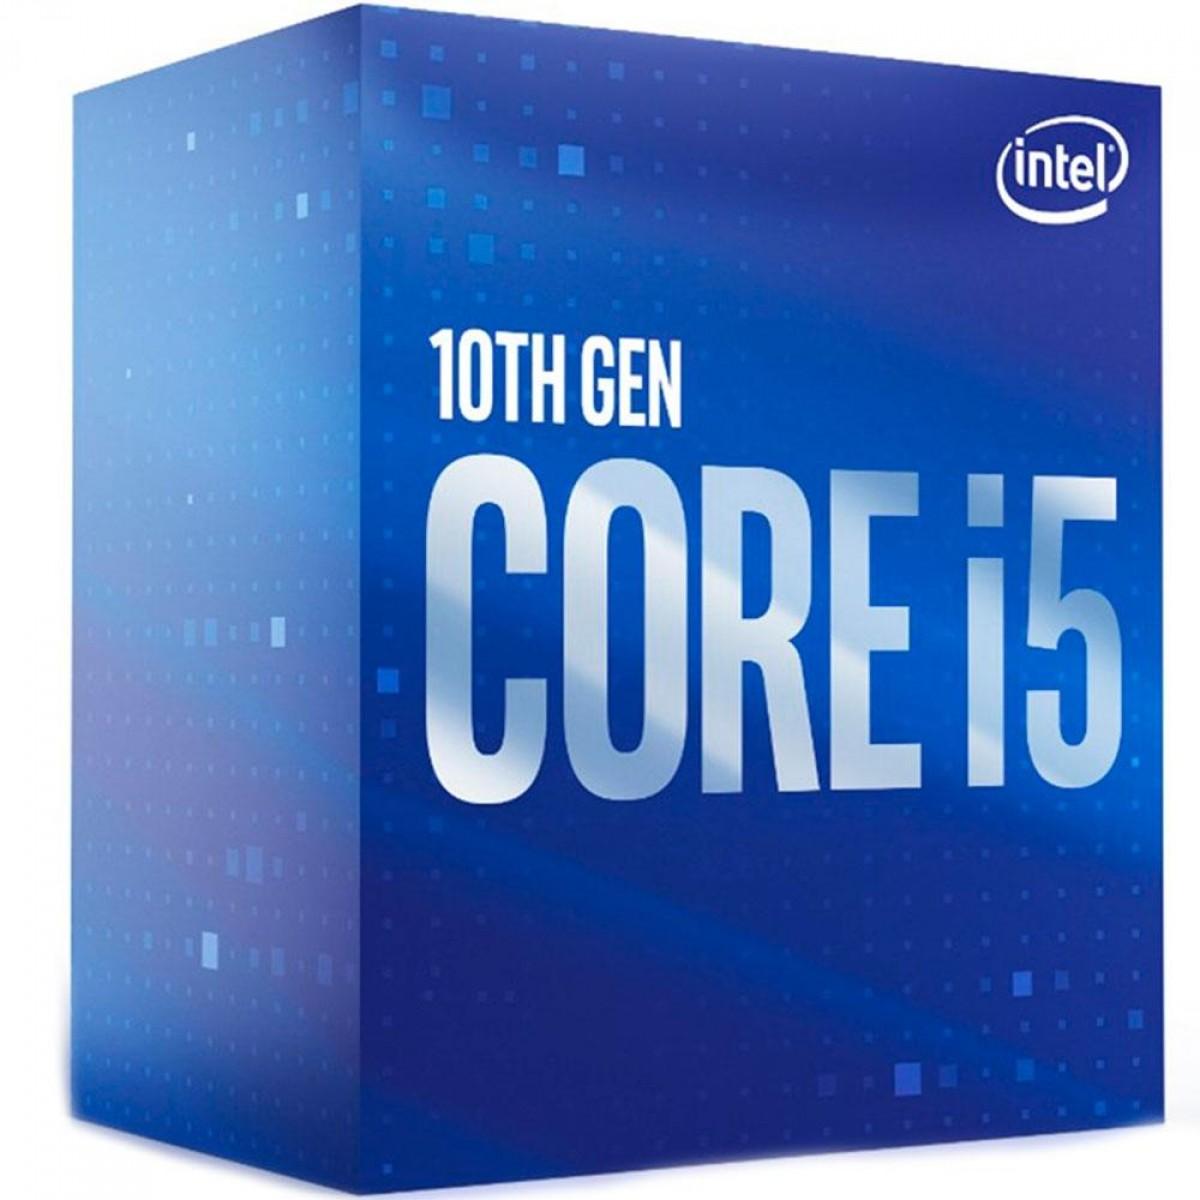 Kit Upgrade Biostar Radeon Rx 550 + Intel Core i5 10400F + Biostar H410MH VER 6.0